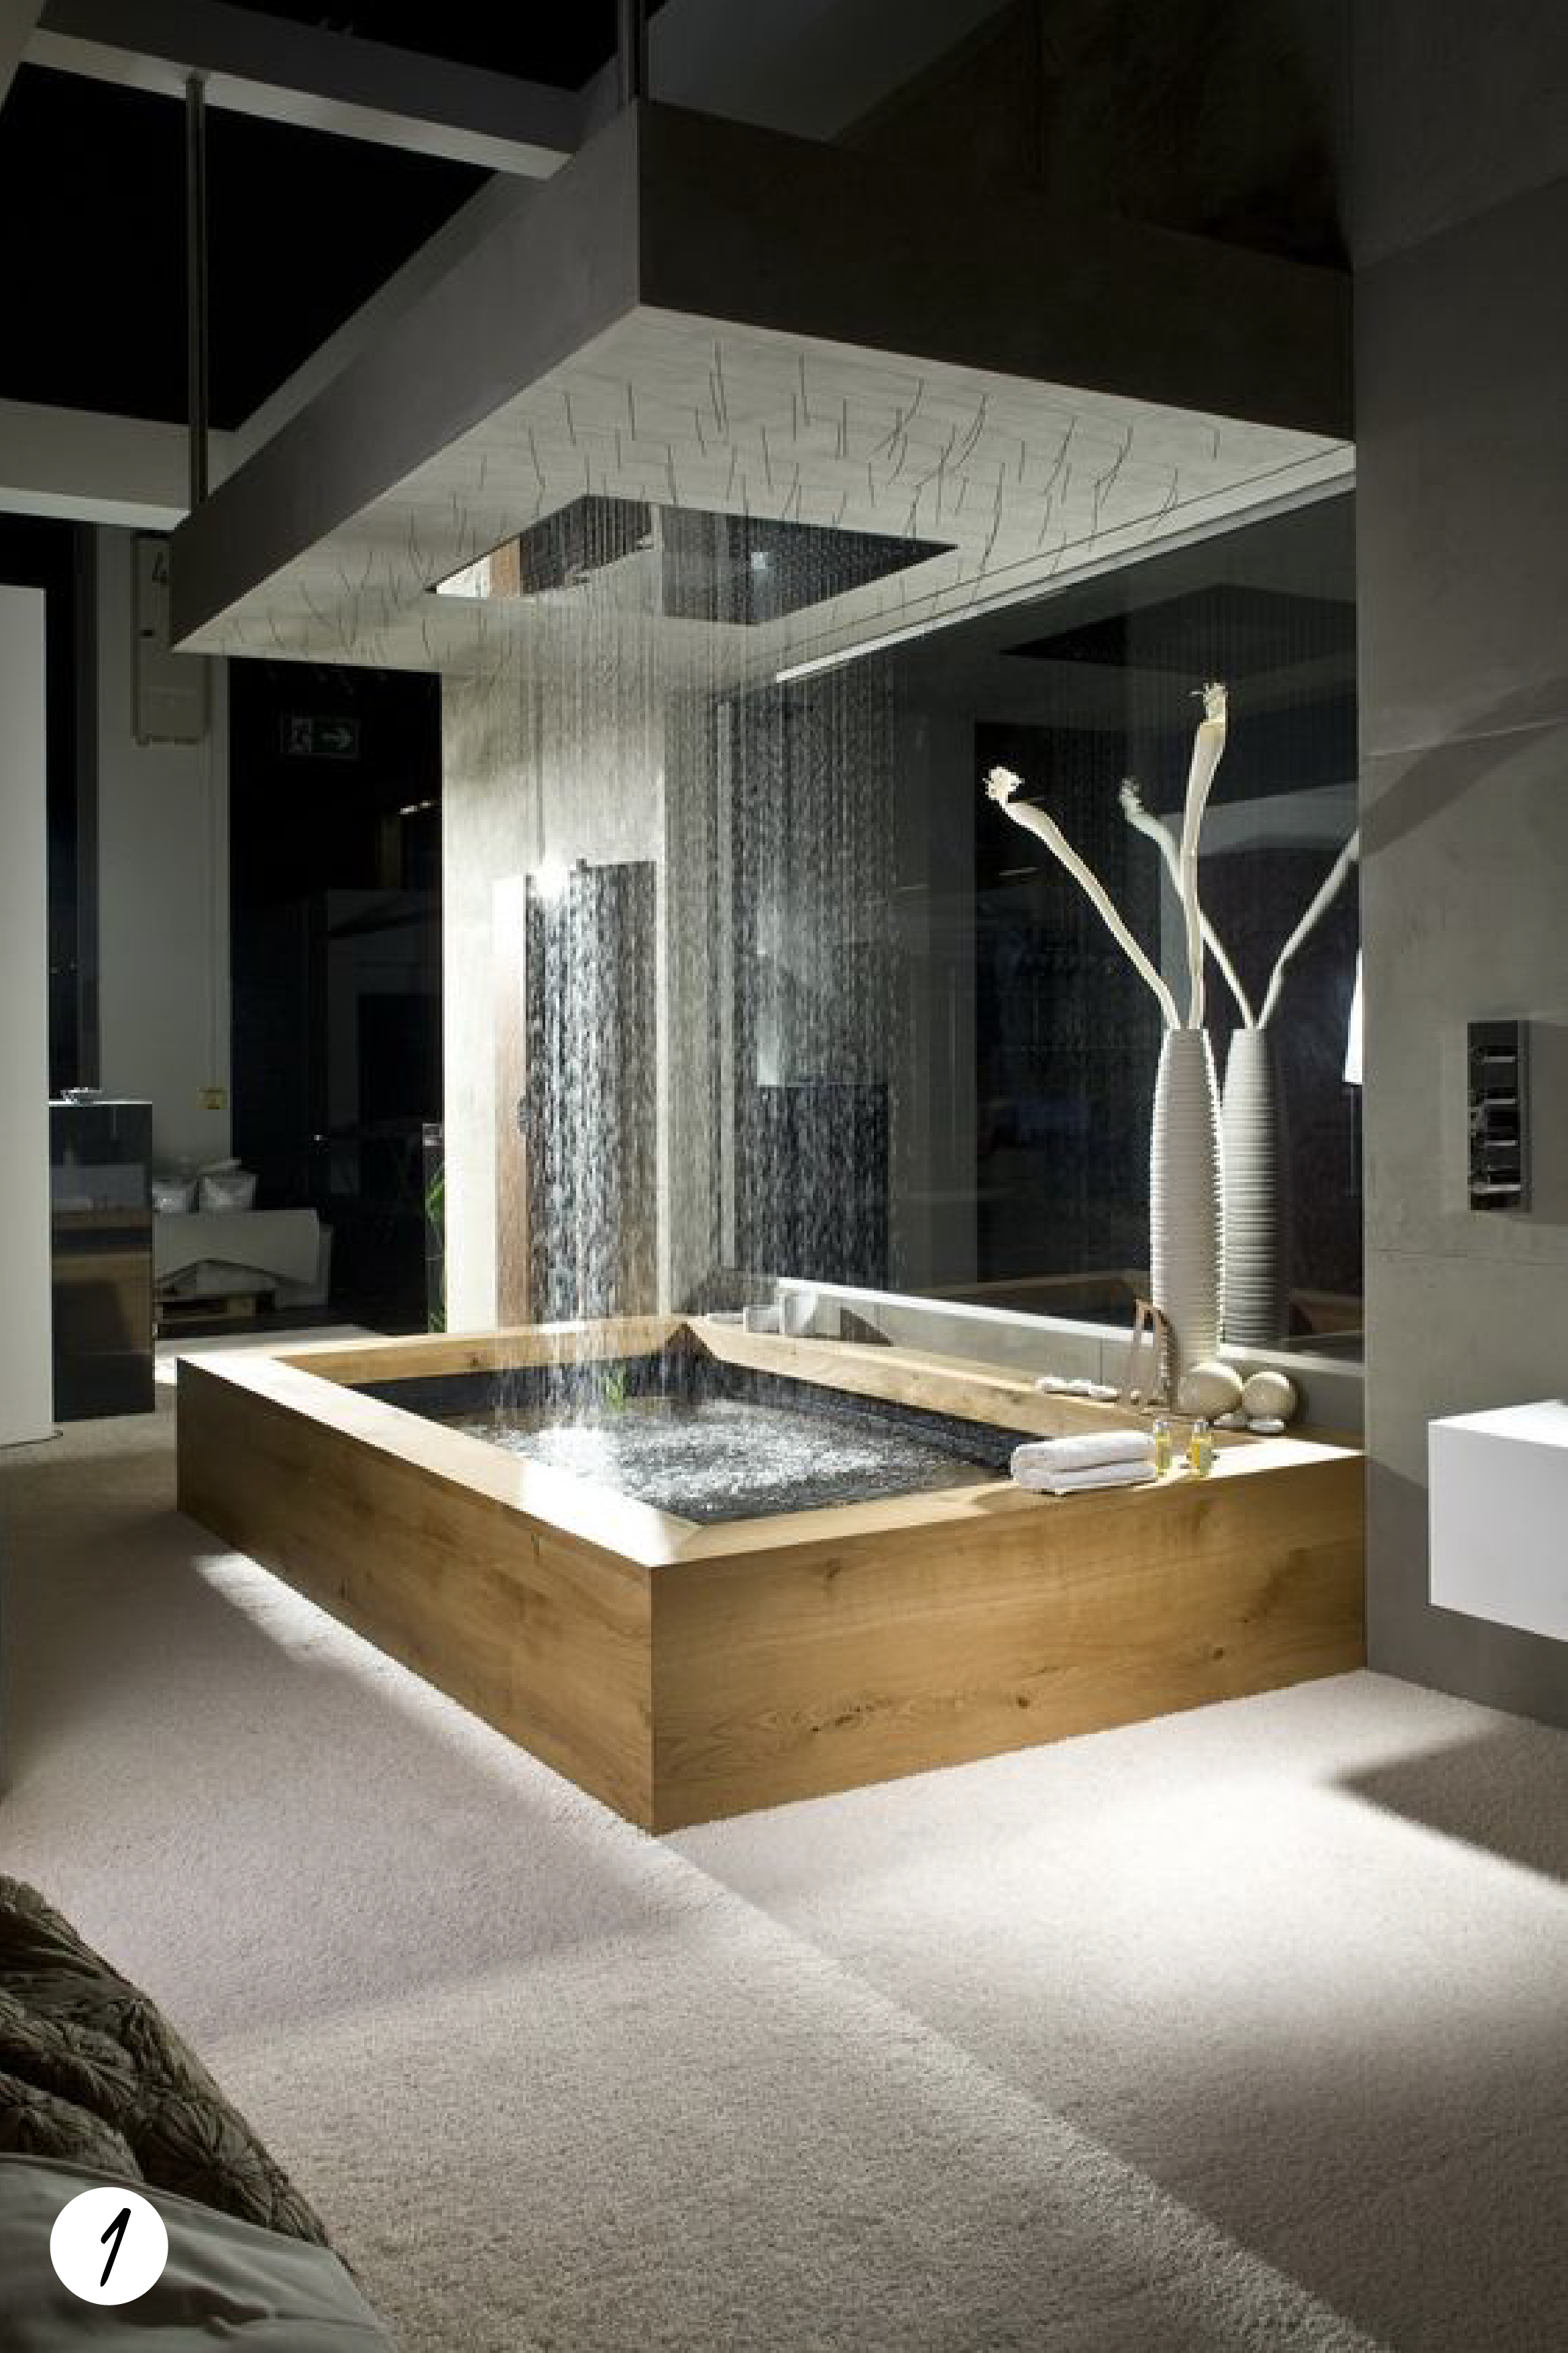 Kirsty Badenhorst Interiors KZN Interior Designer Blog